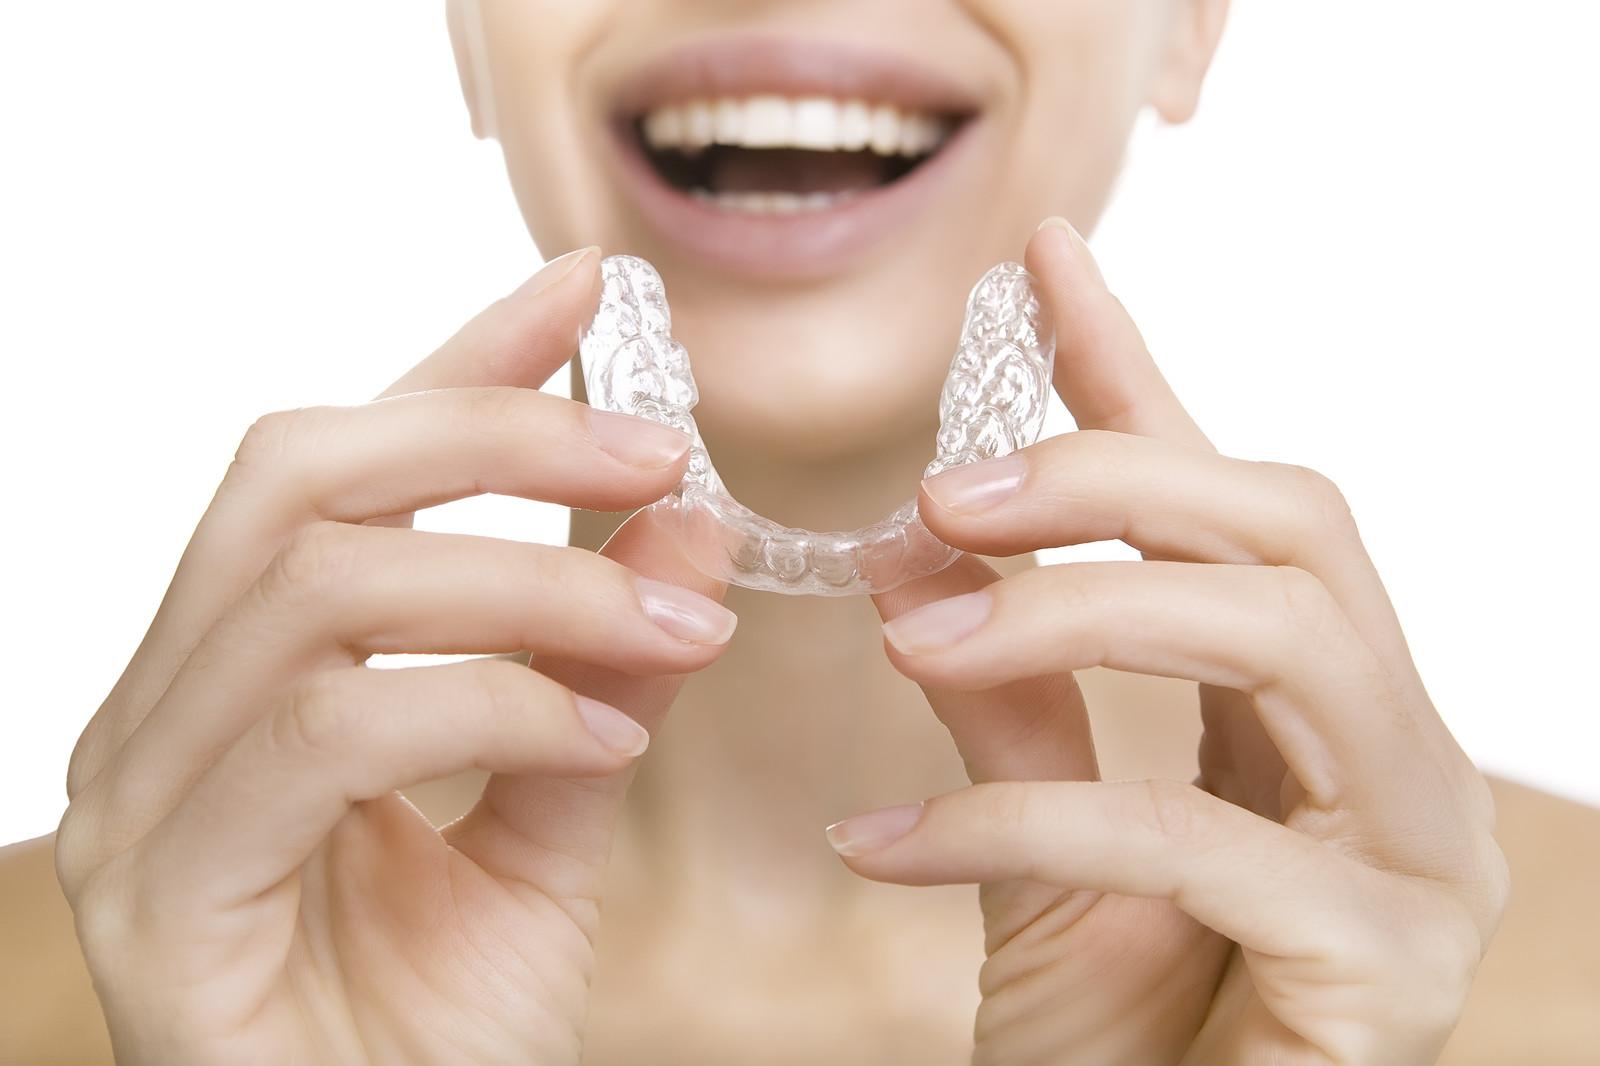 ortodoncia-transparente Ortodoncia transparente